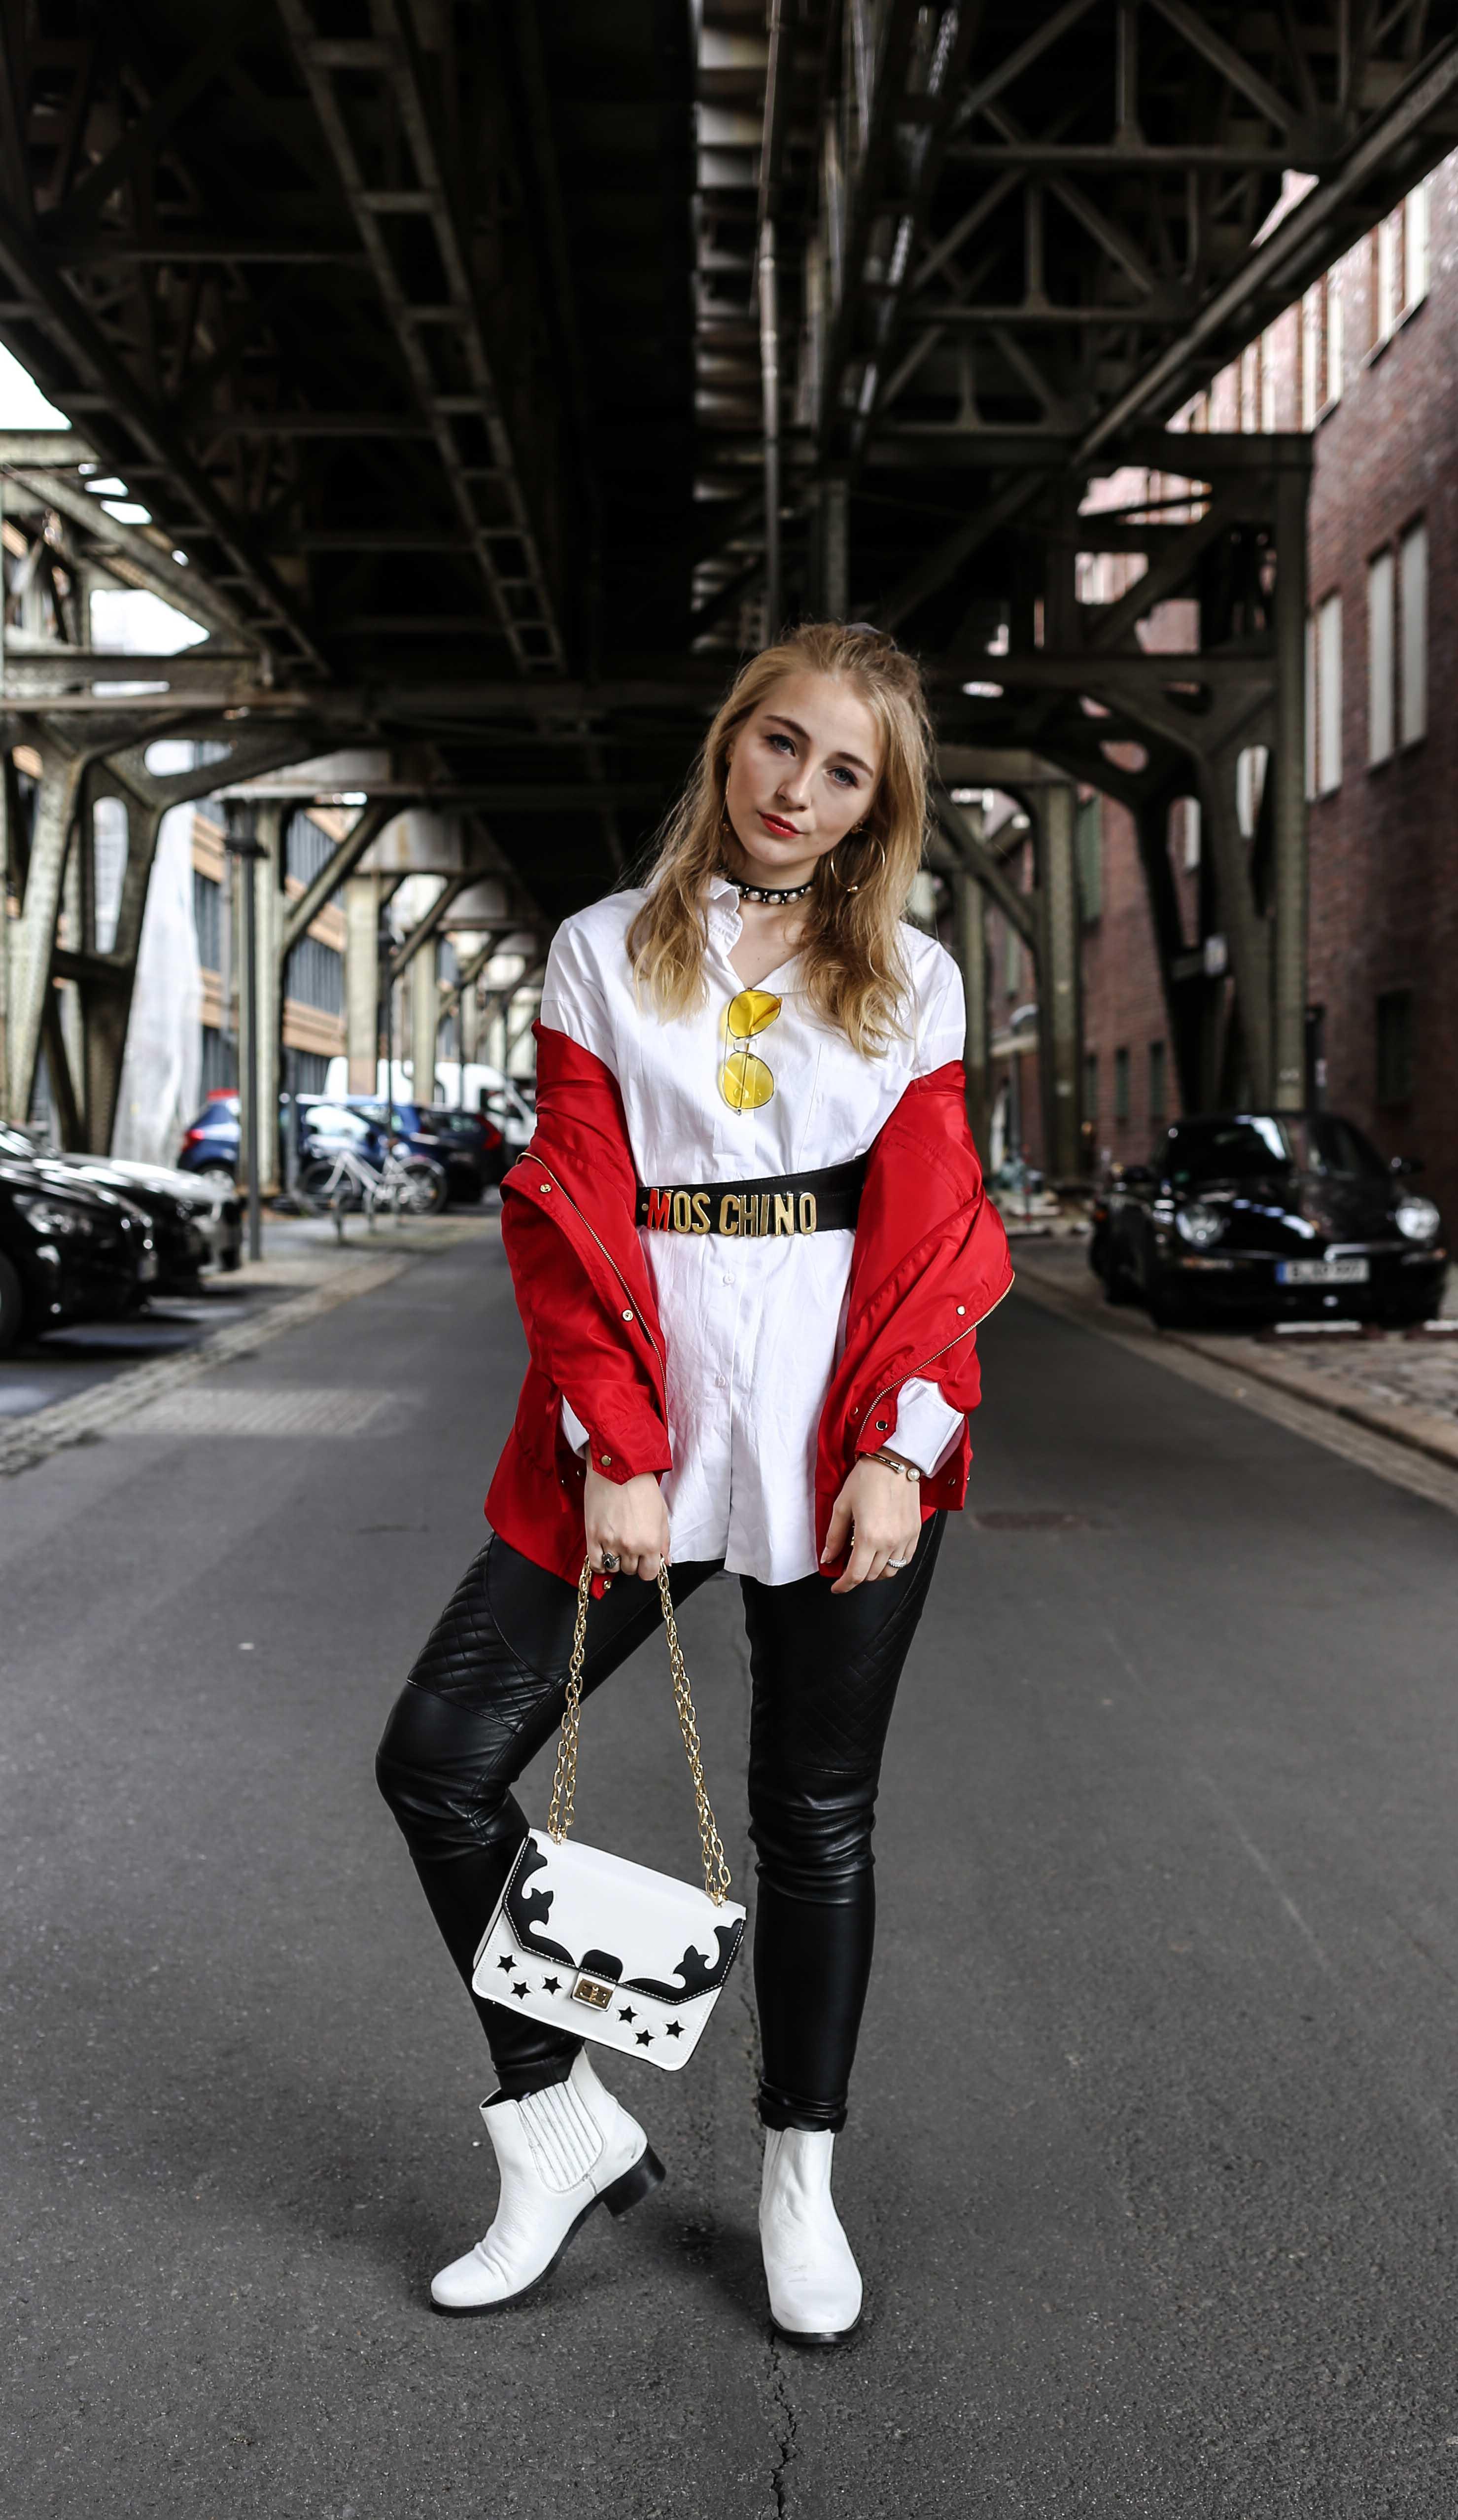 fashion-week-look-rote-regenjacke-grunge-outfit-berlin-modeblog-fashionblog_9271